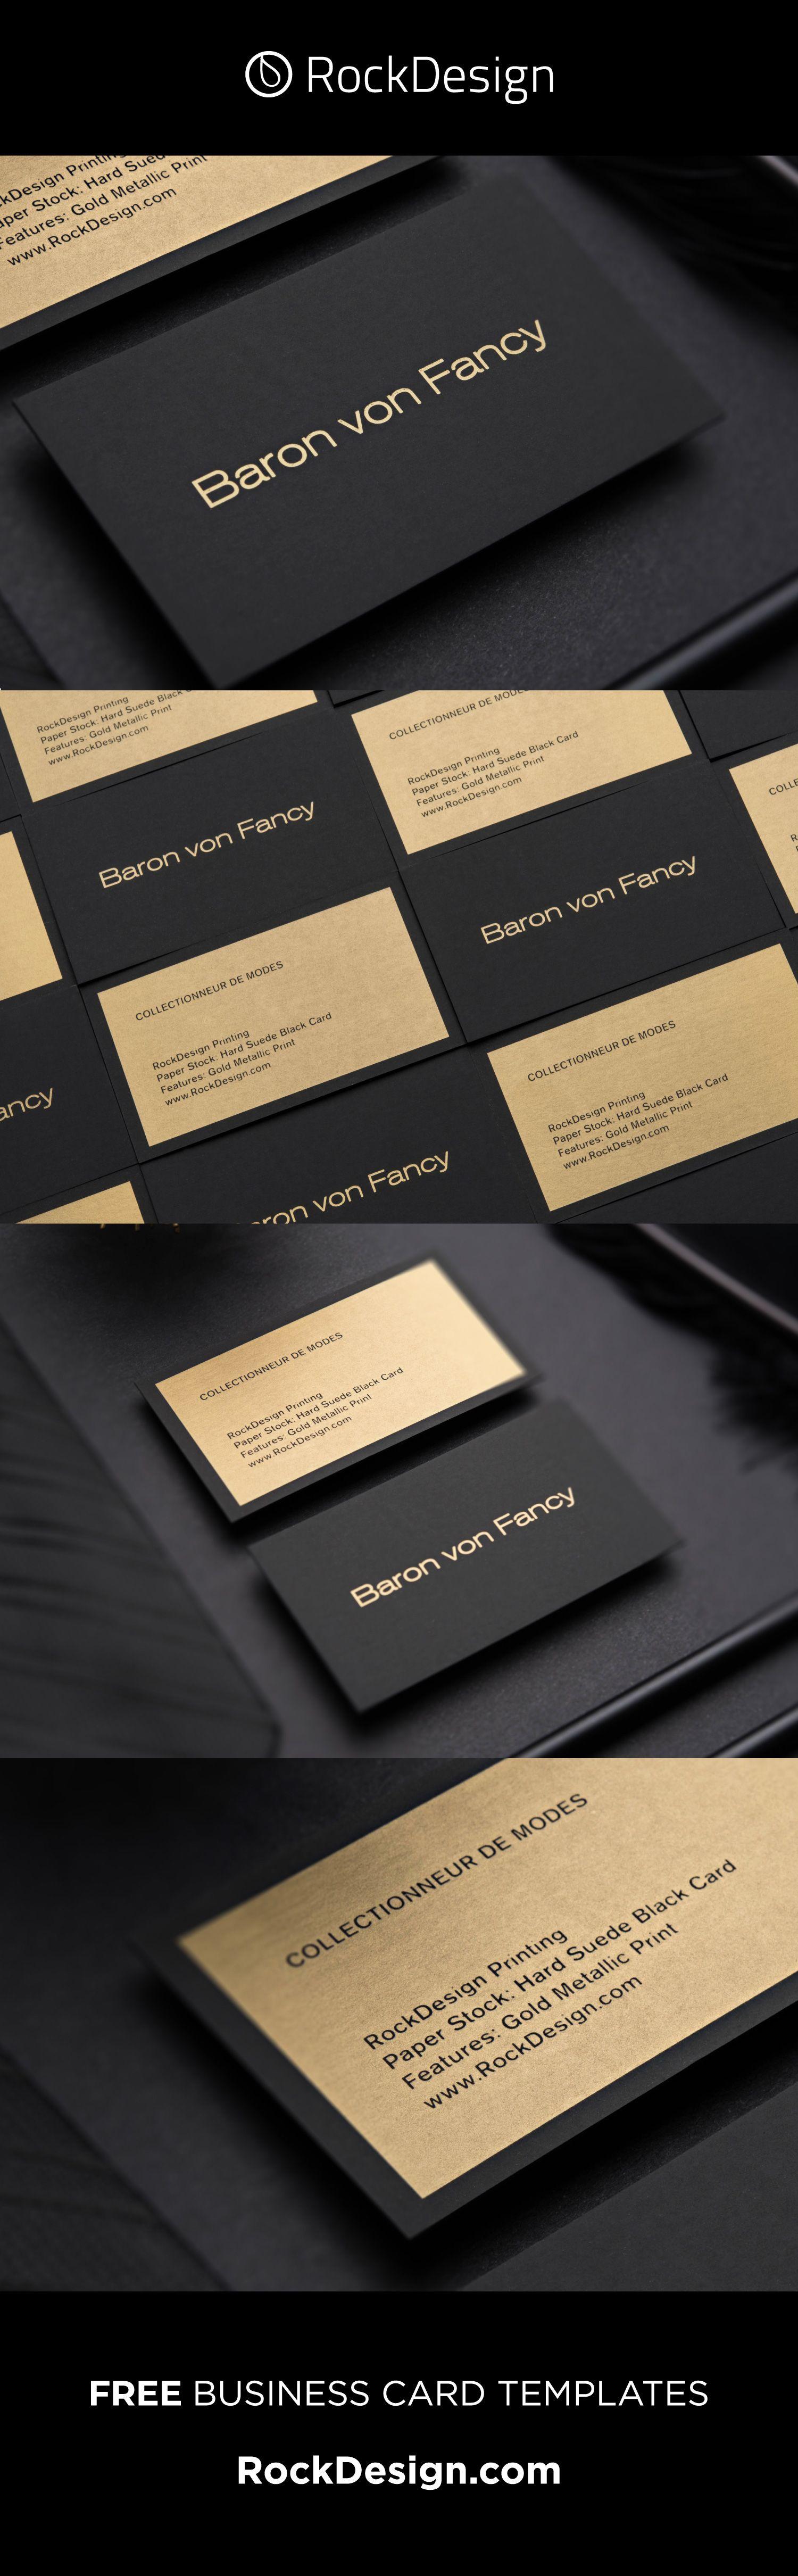 Metallic Printing Simple Professional Black Visit Card Design Baron Von Fancy Free Business Card Templates Luxury Business Cards Business Card Design